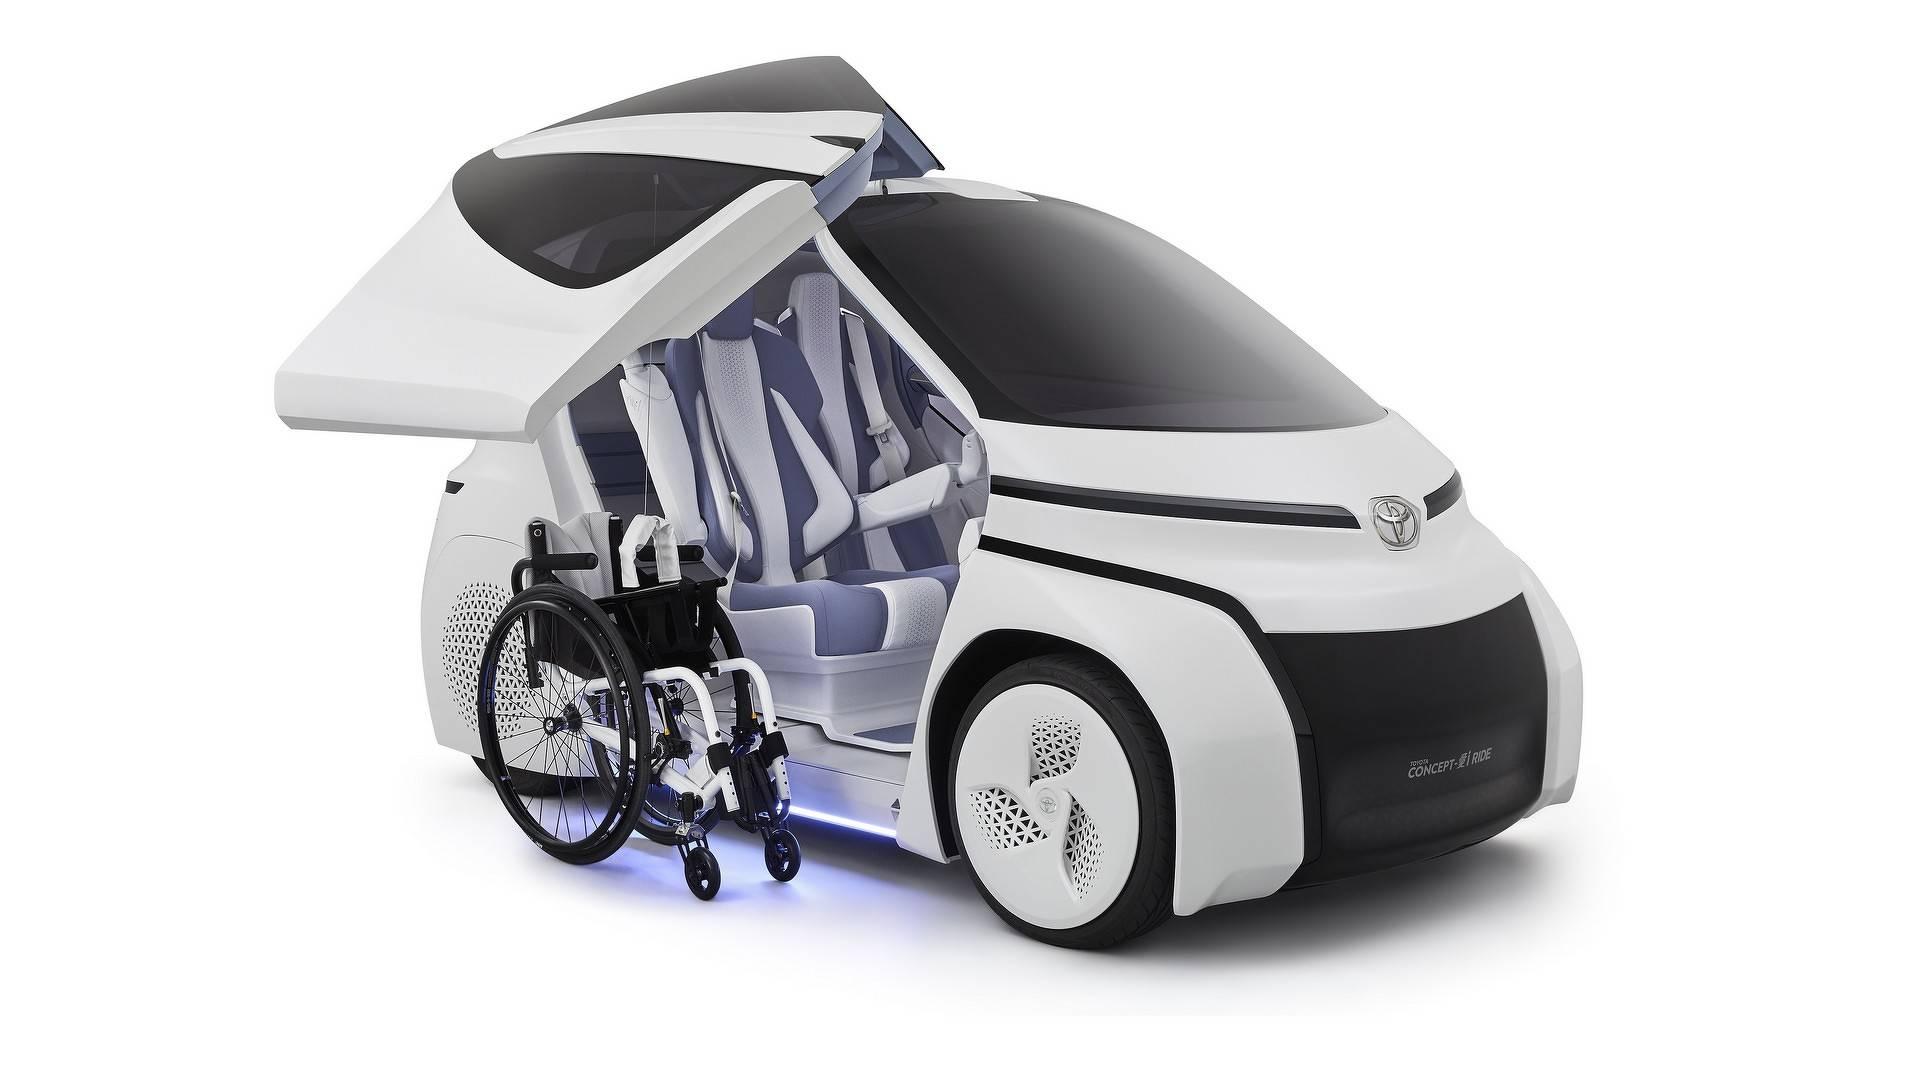 Toyota Concept-i Ride (8)